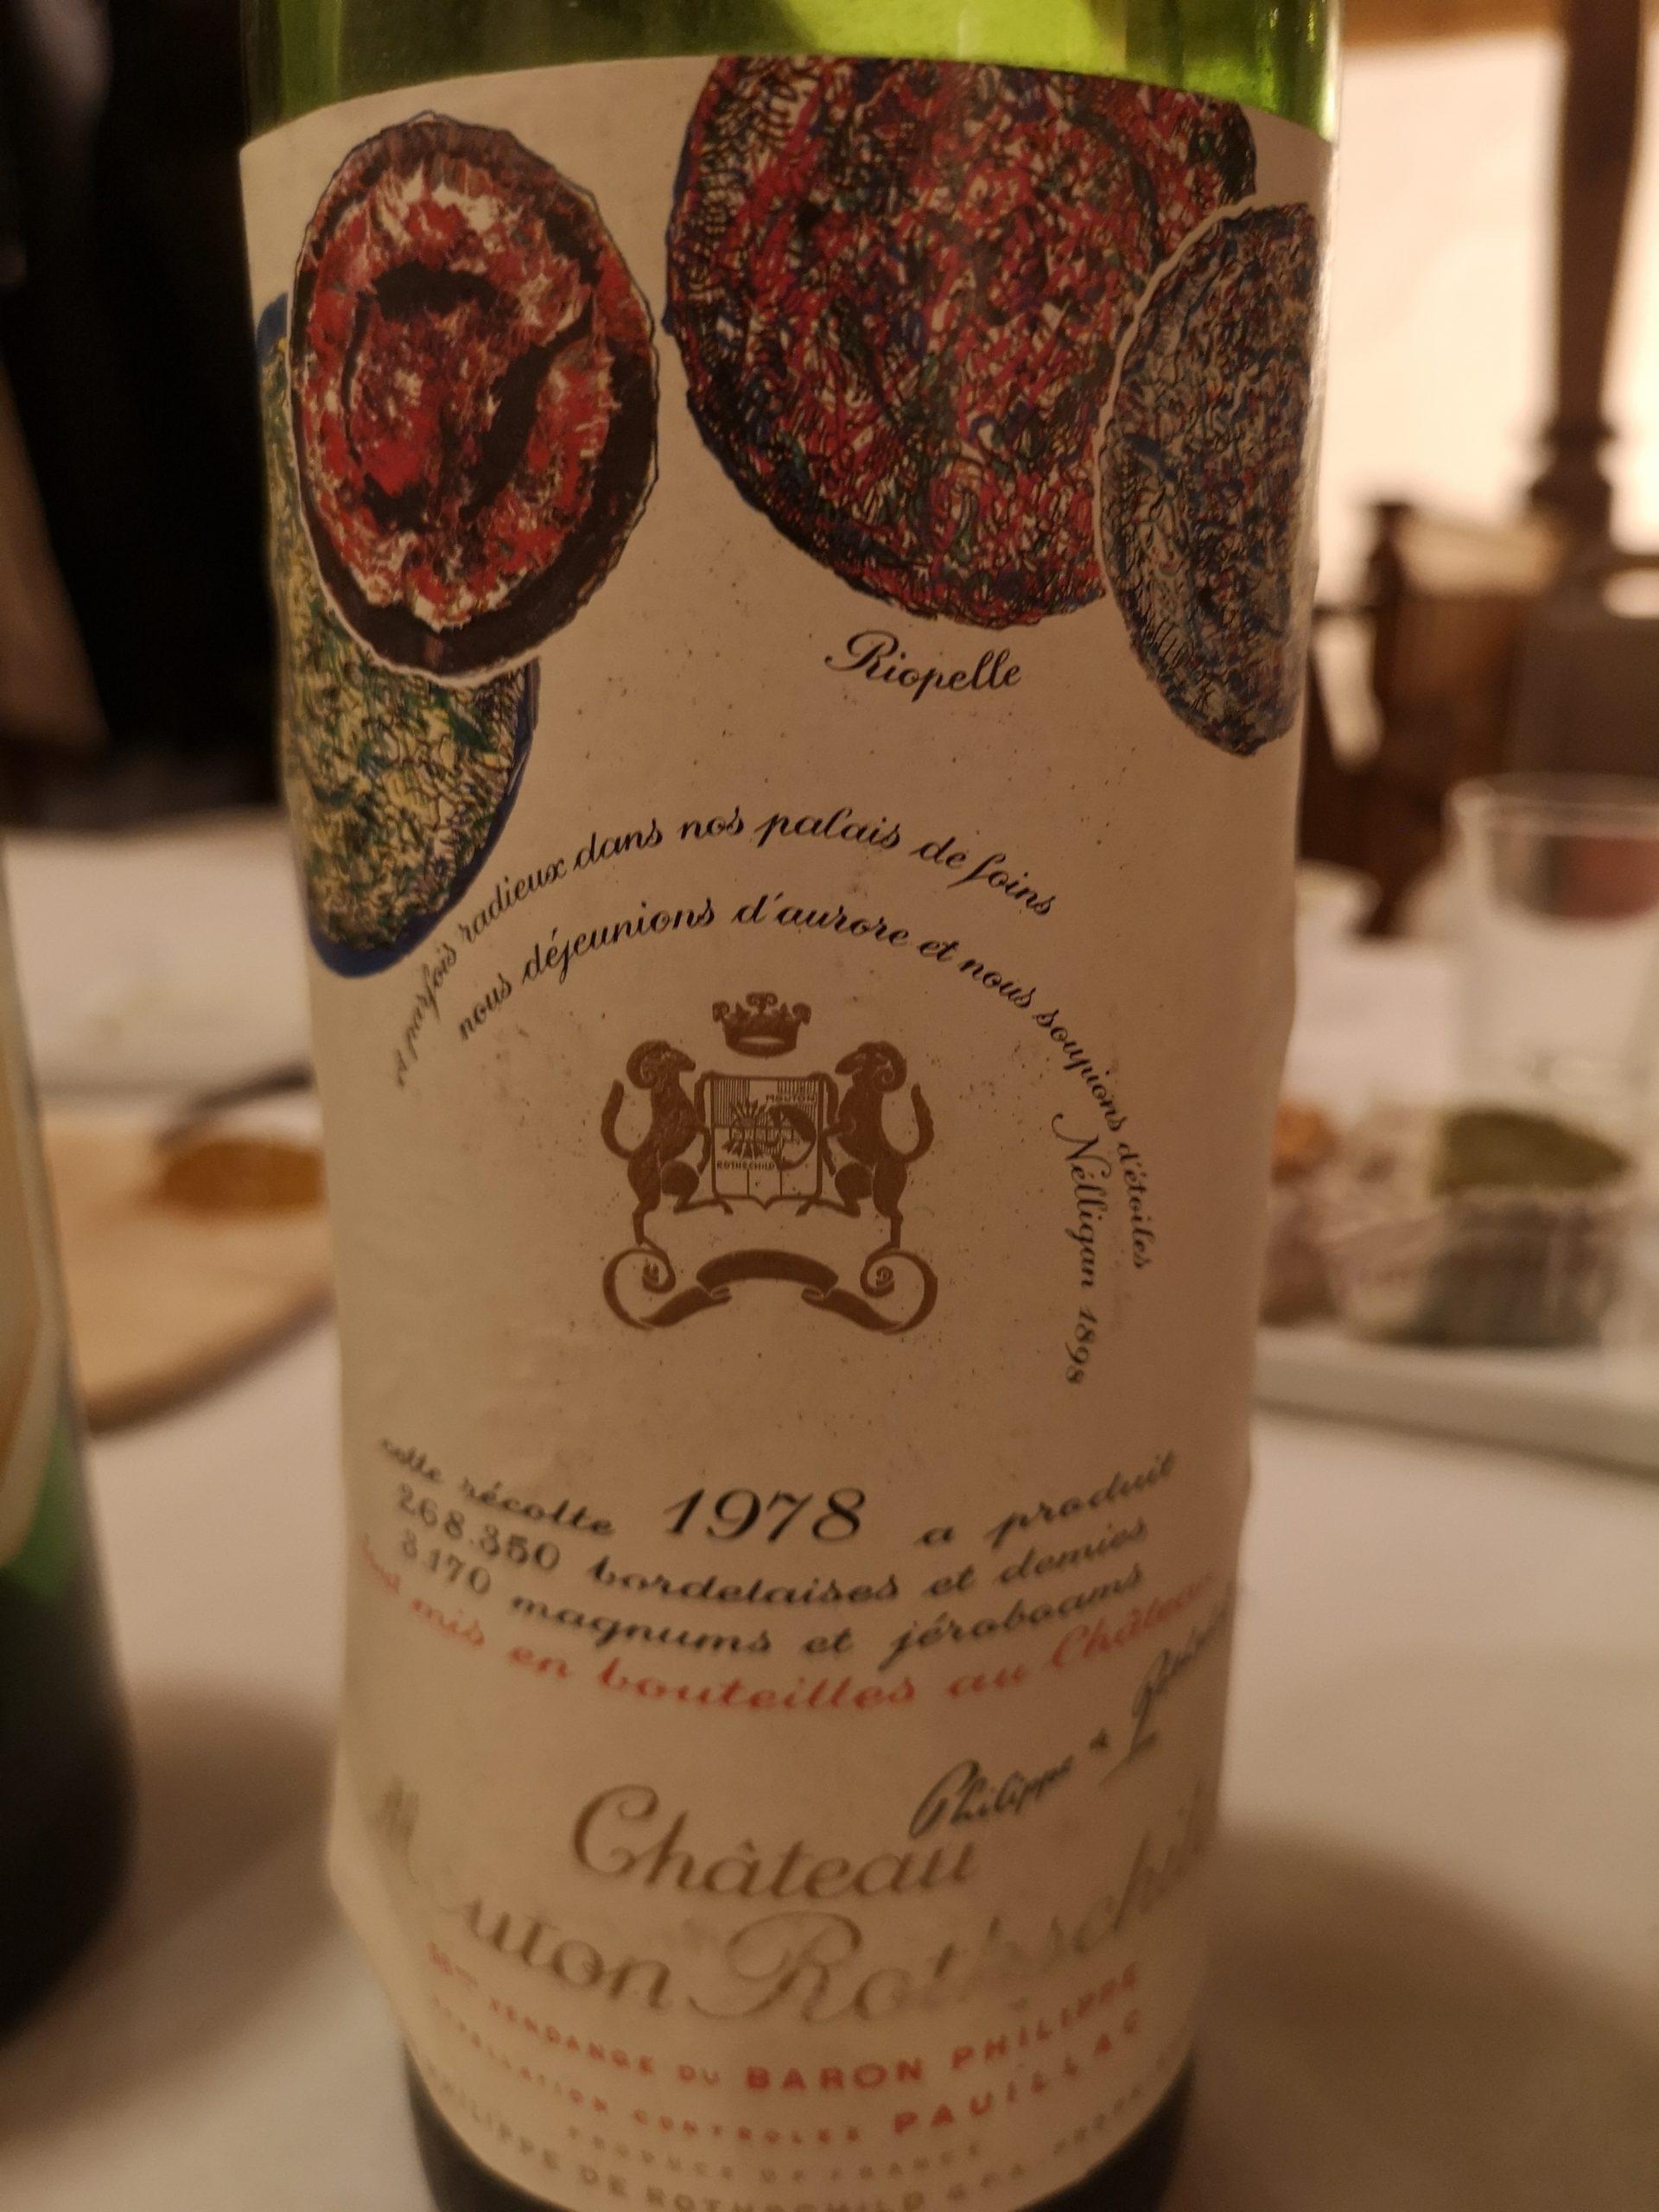 1978 Mouton-Rothschild | Château Mouton-Rothschild